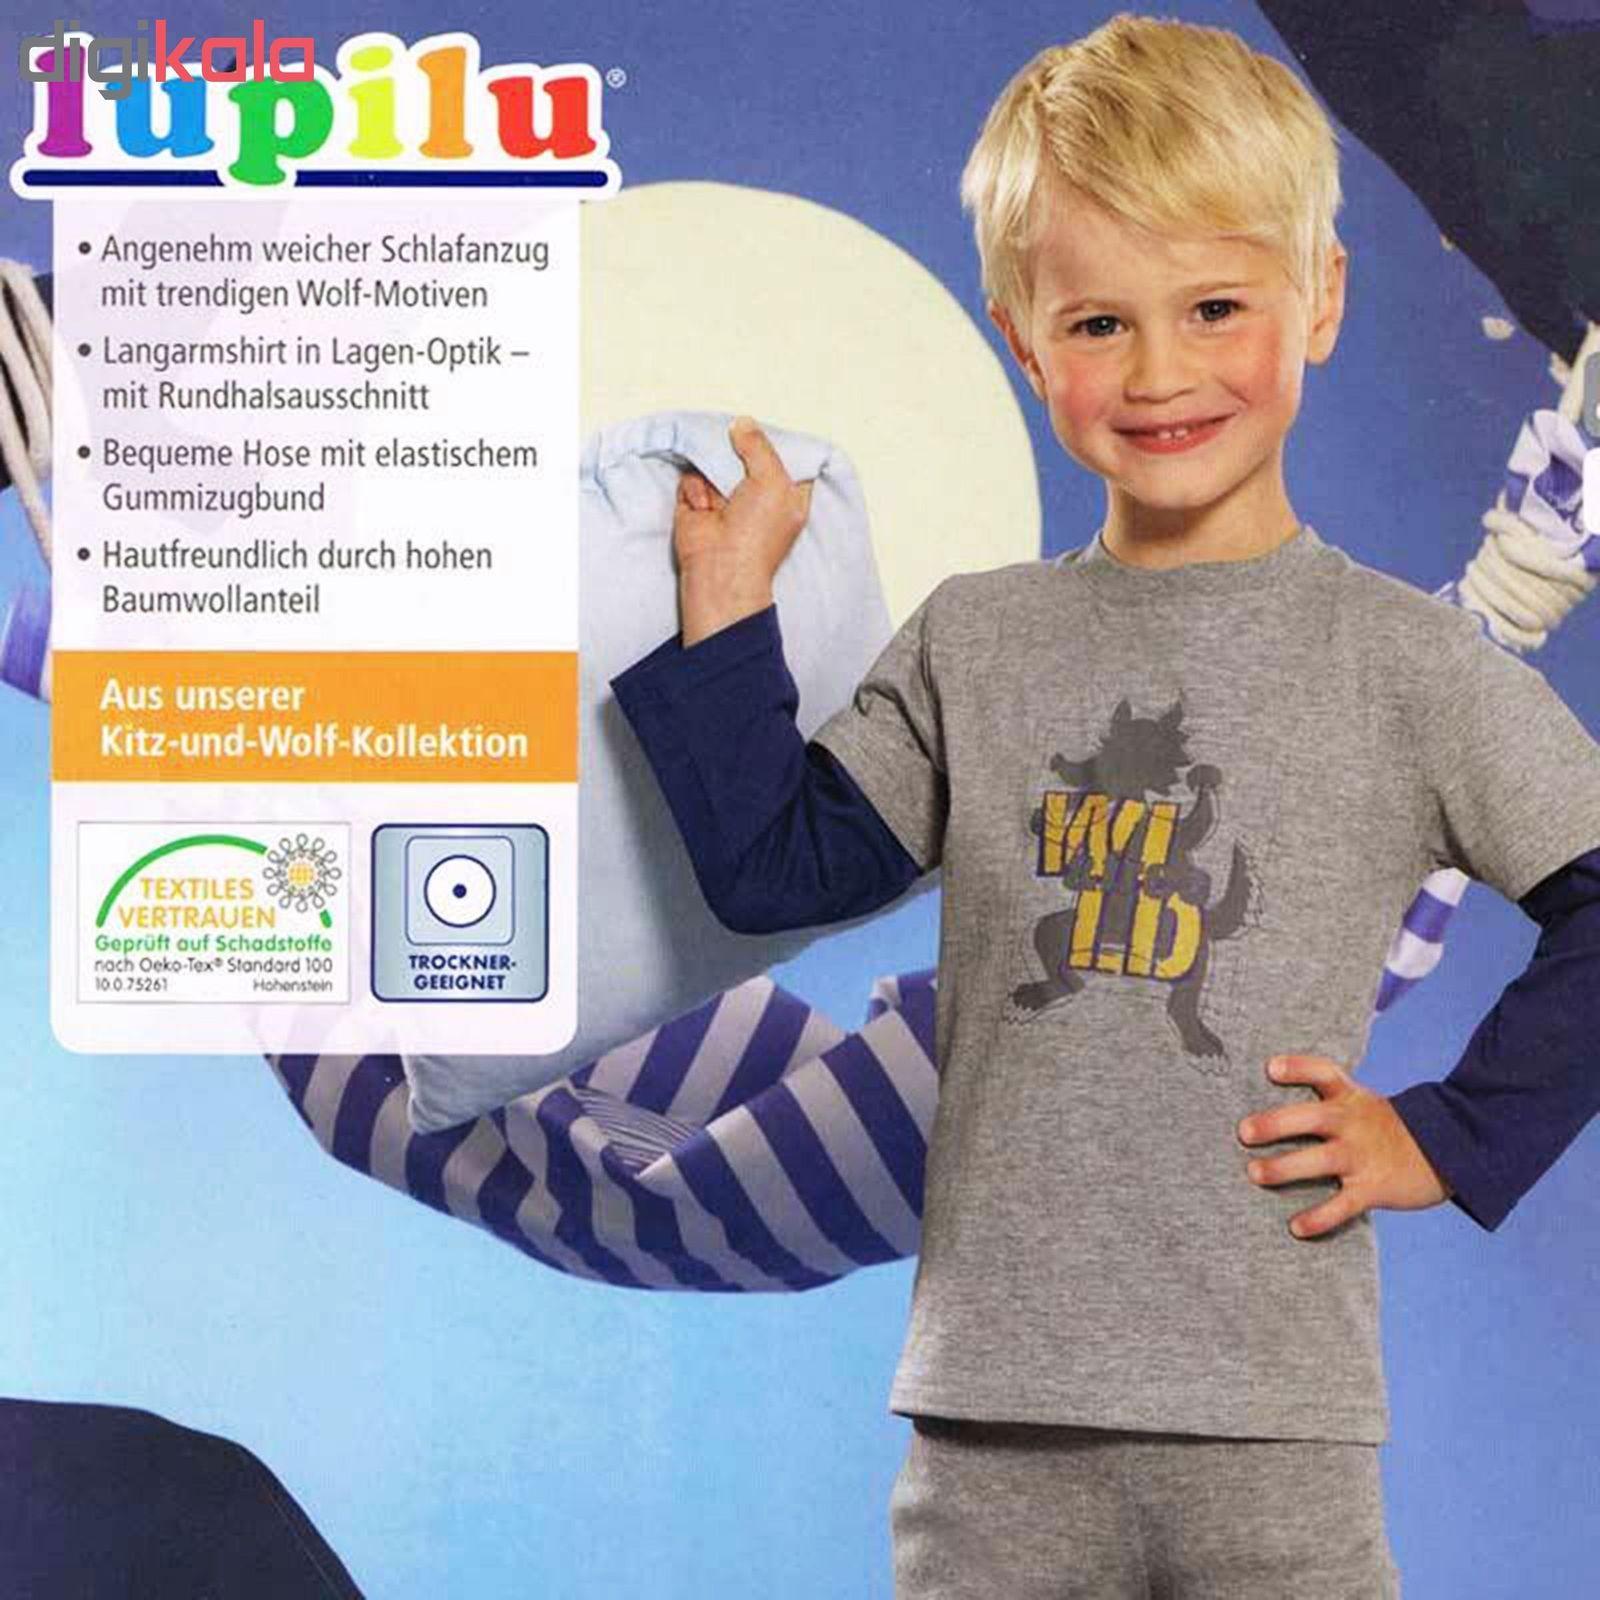 ست تی شرت و شلوار پسرانه لوپیلو مدل Wild WOLF main 1 3